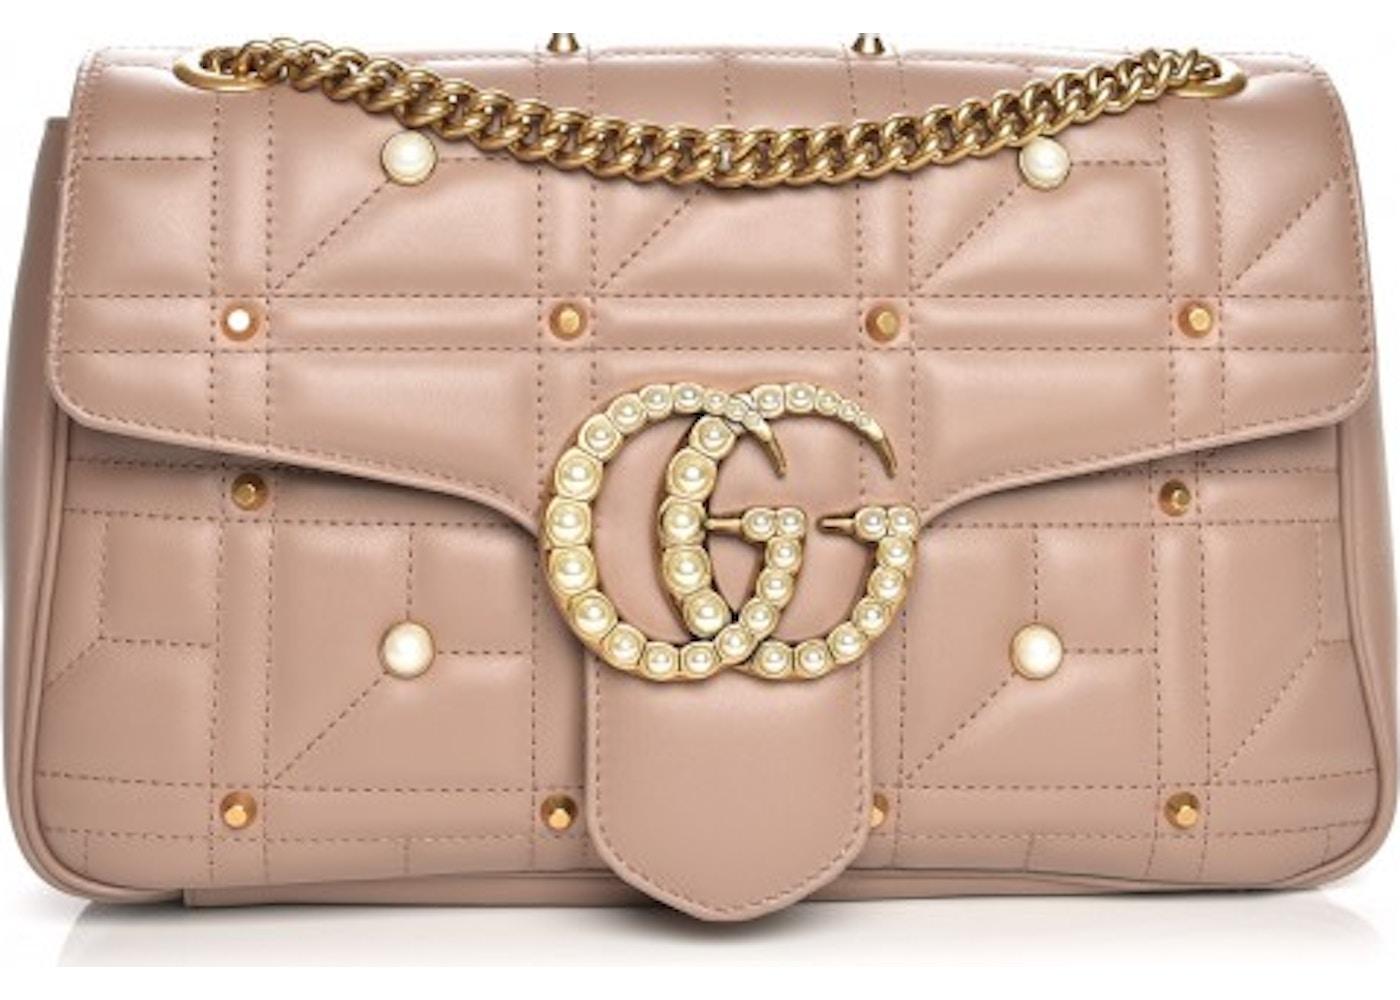 2564acd6a41e Gucci Marmont Shoulder Bag Matelasse Pearly Medium Dusty Pink. Matelasse  Pearly Medium Dusty Pink